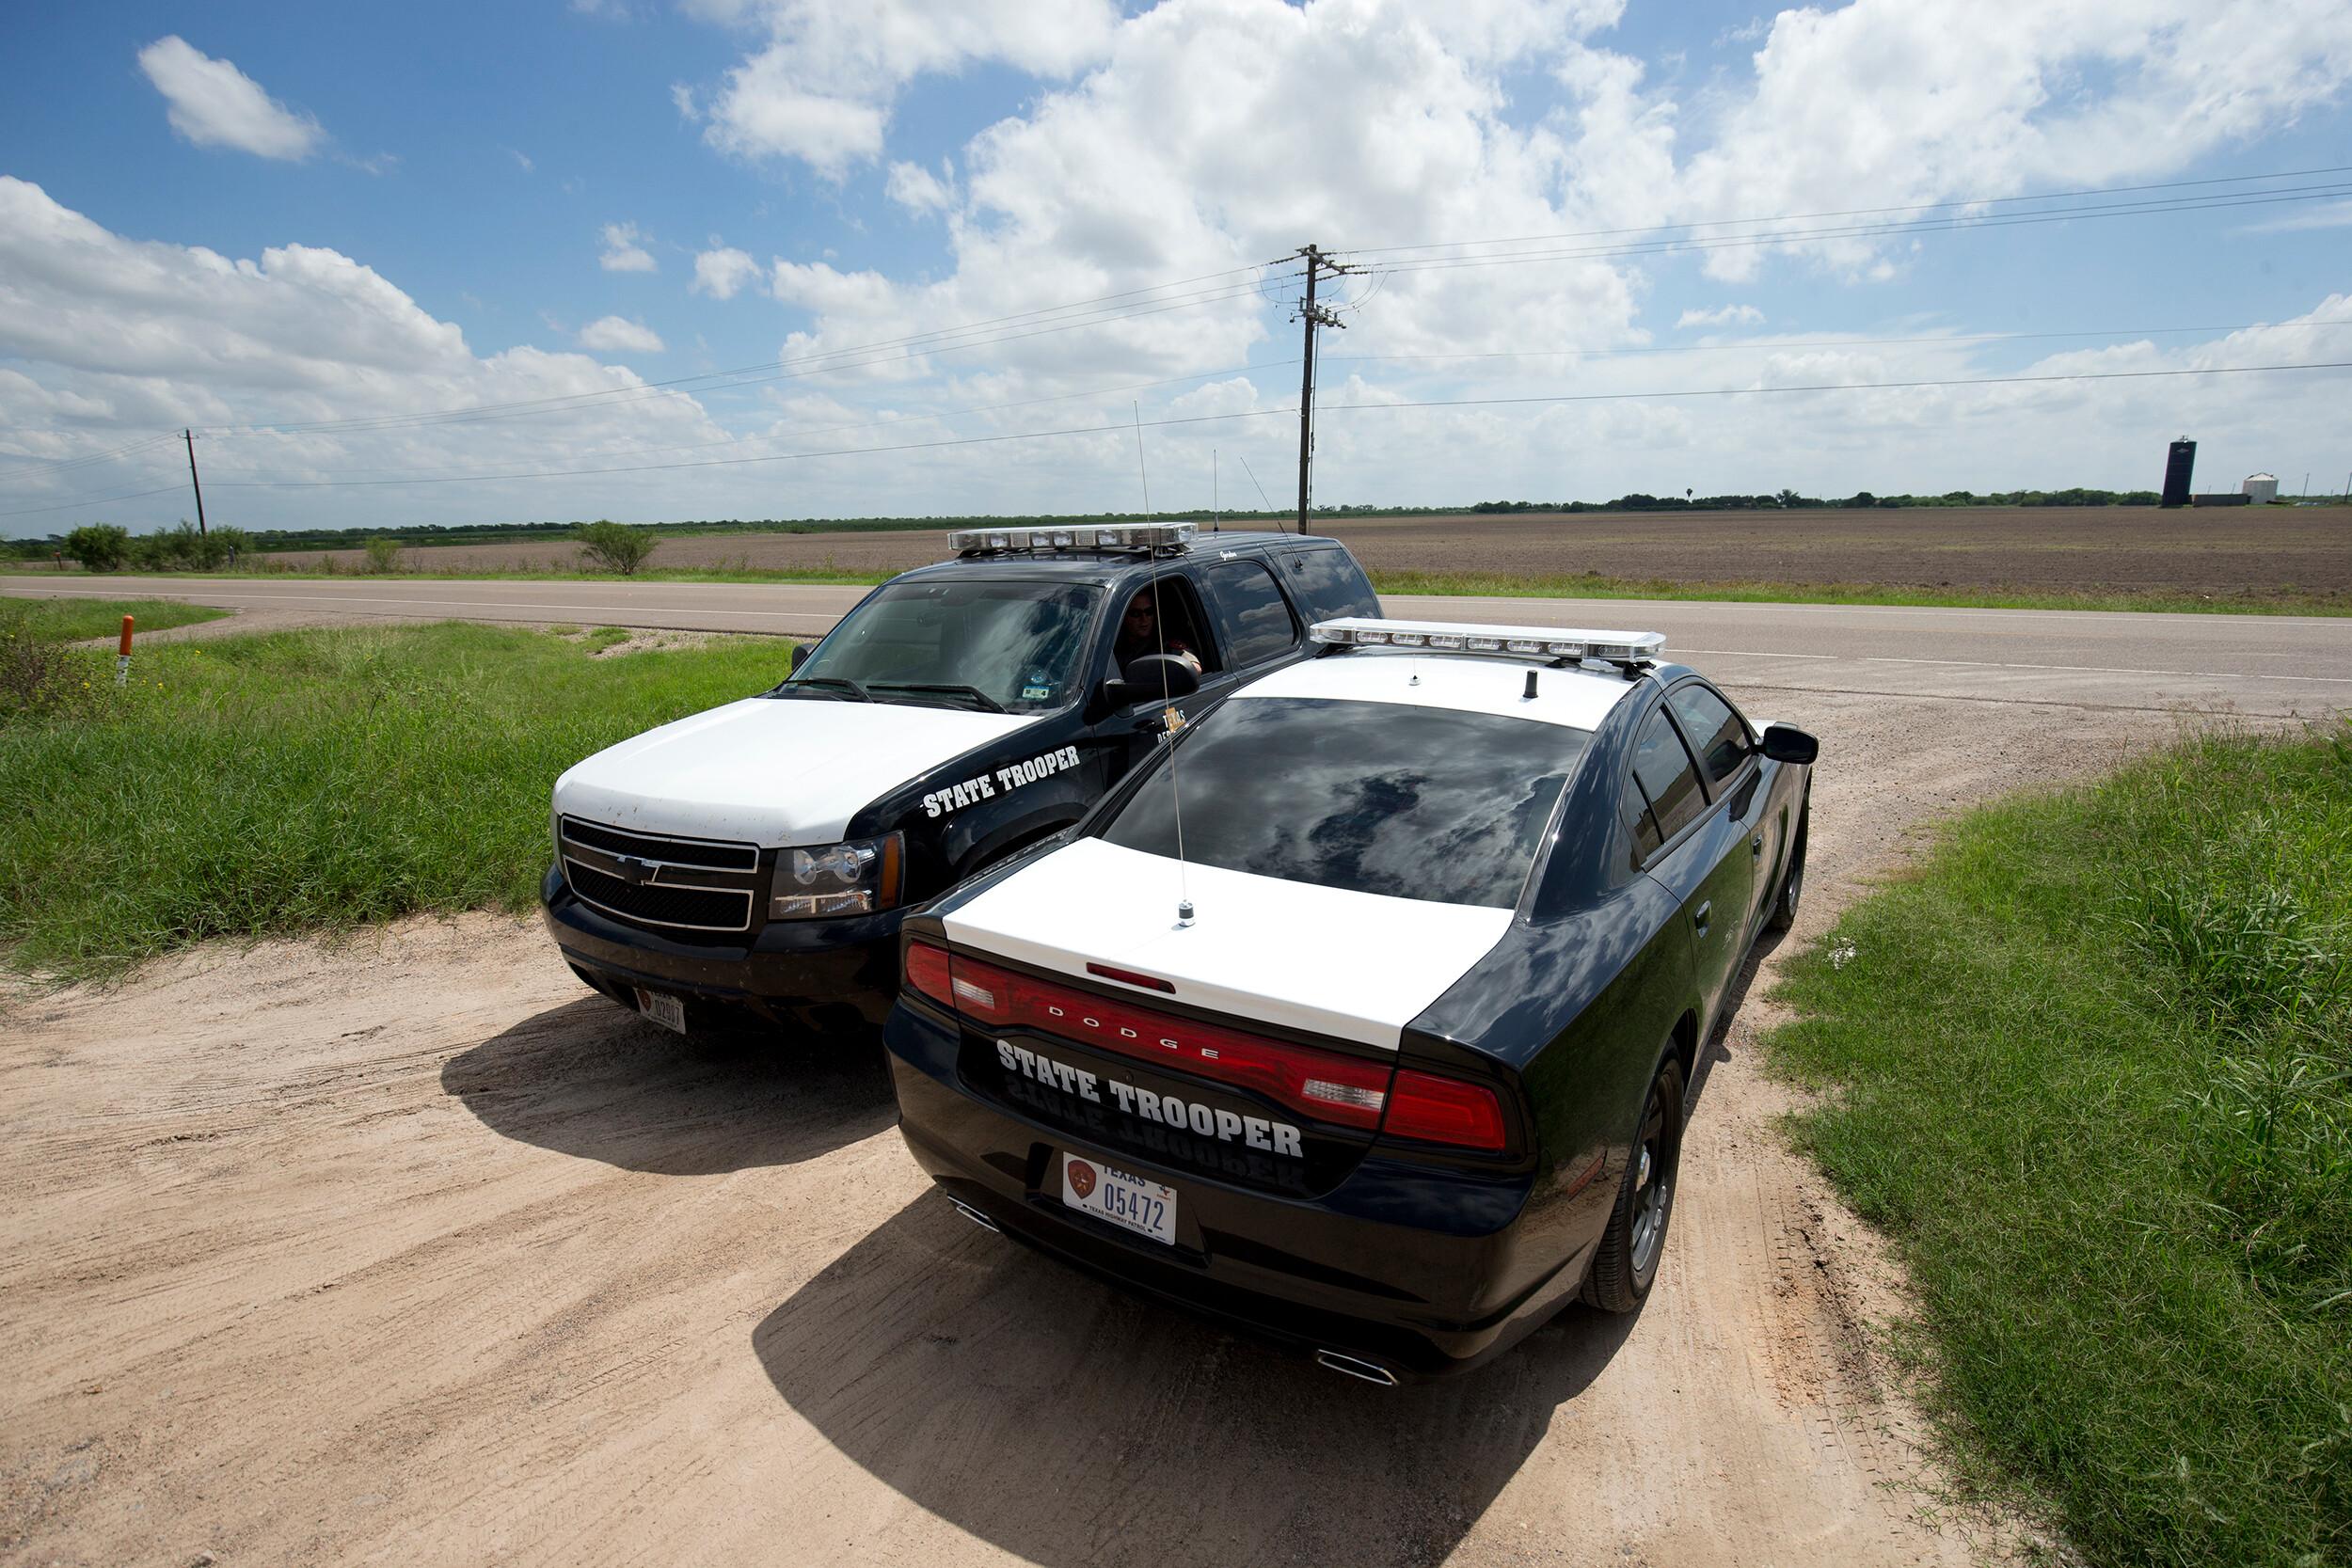 Judge temporarily blocks Texas order targeting transport of migrants